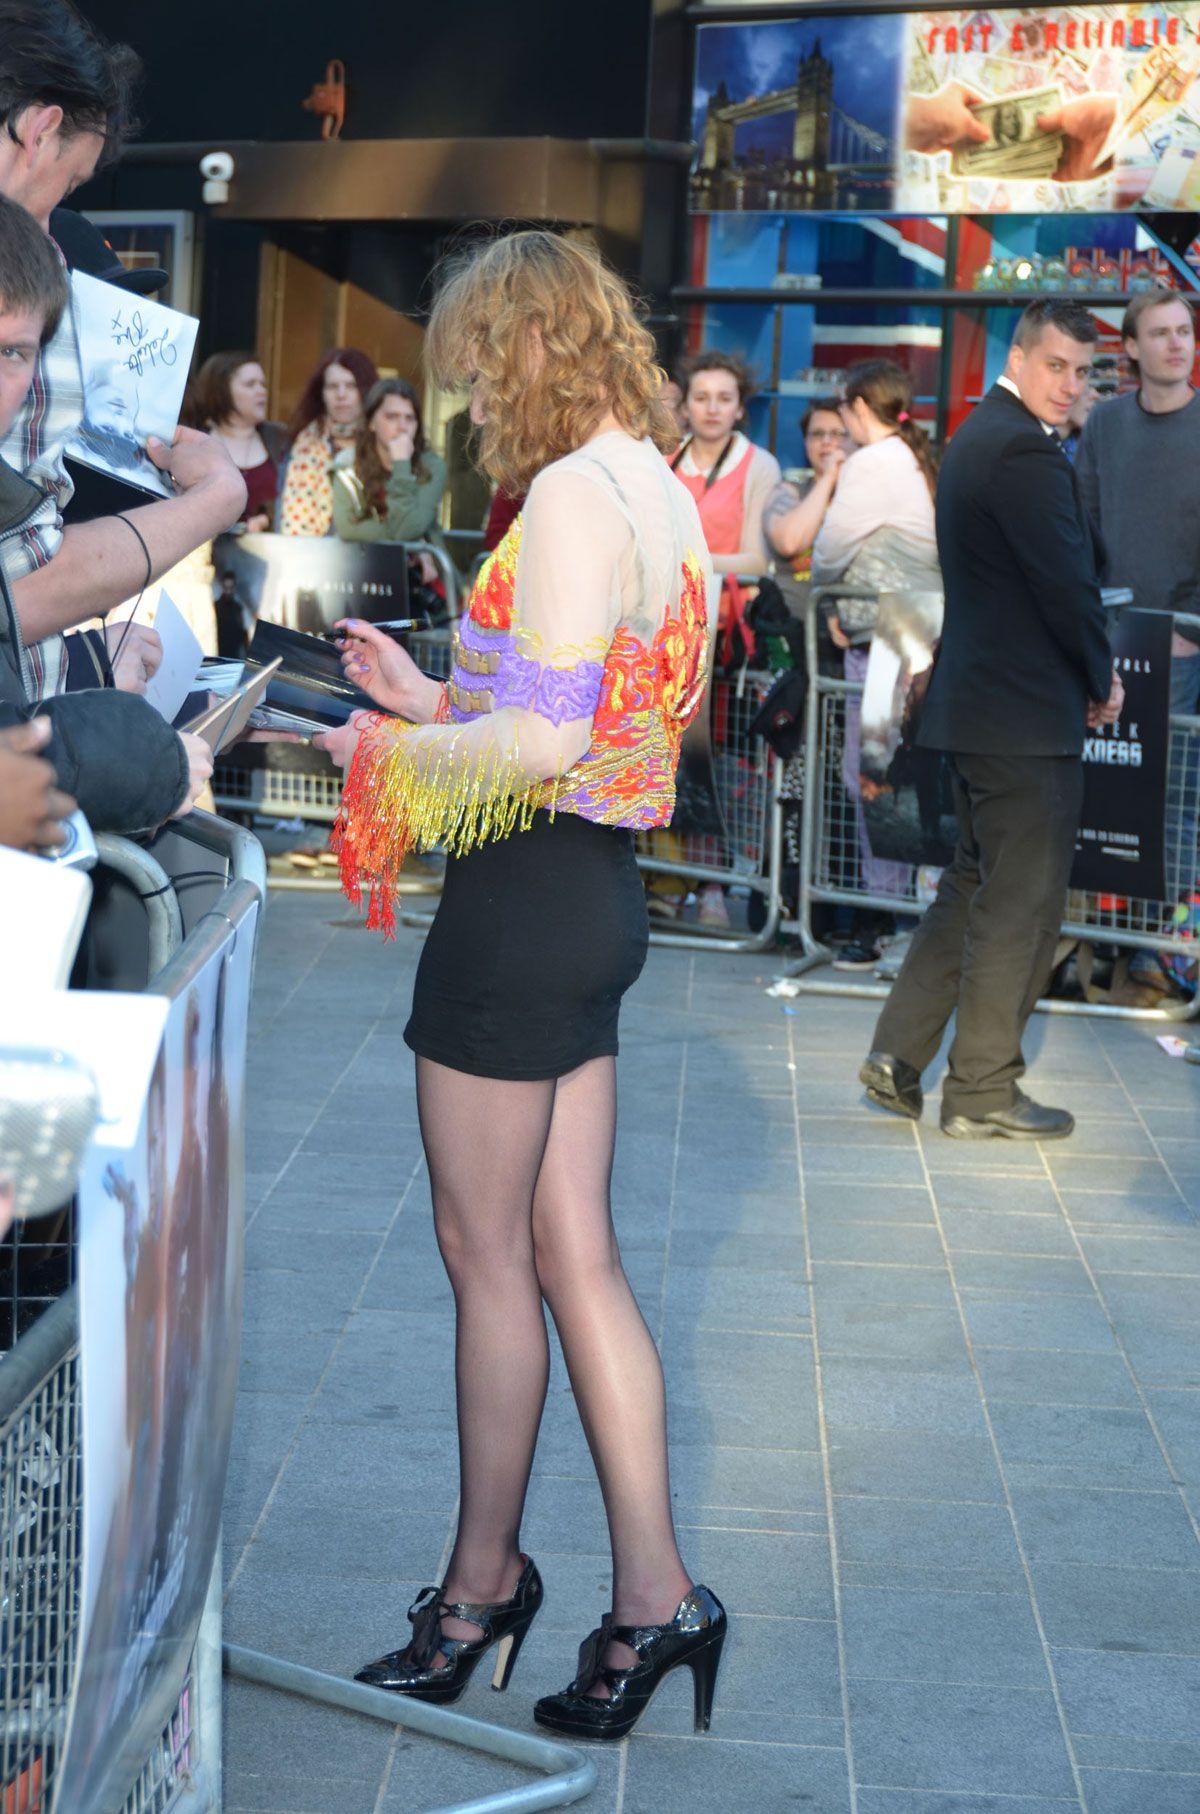 Cleavage Dakota Blue Richards (born 1994) nudes (78 pictures) Tits, 2020, panties